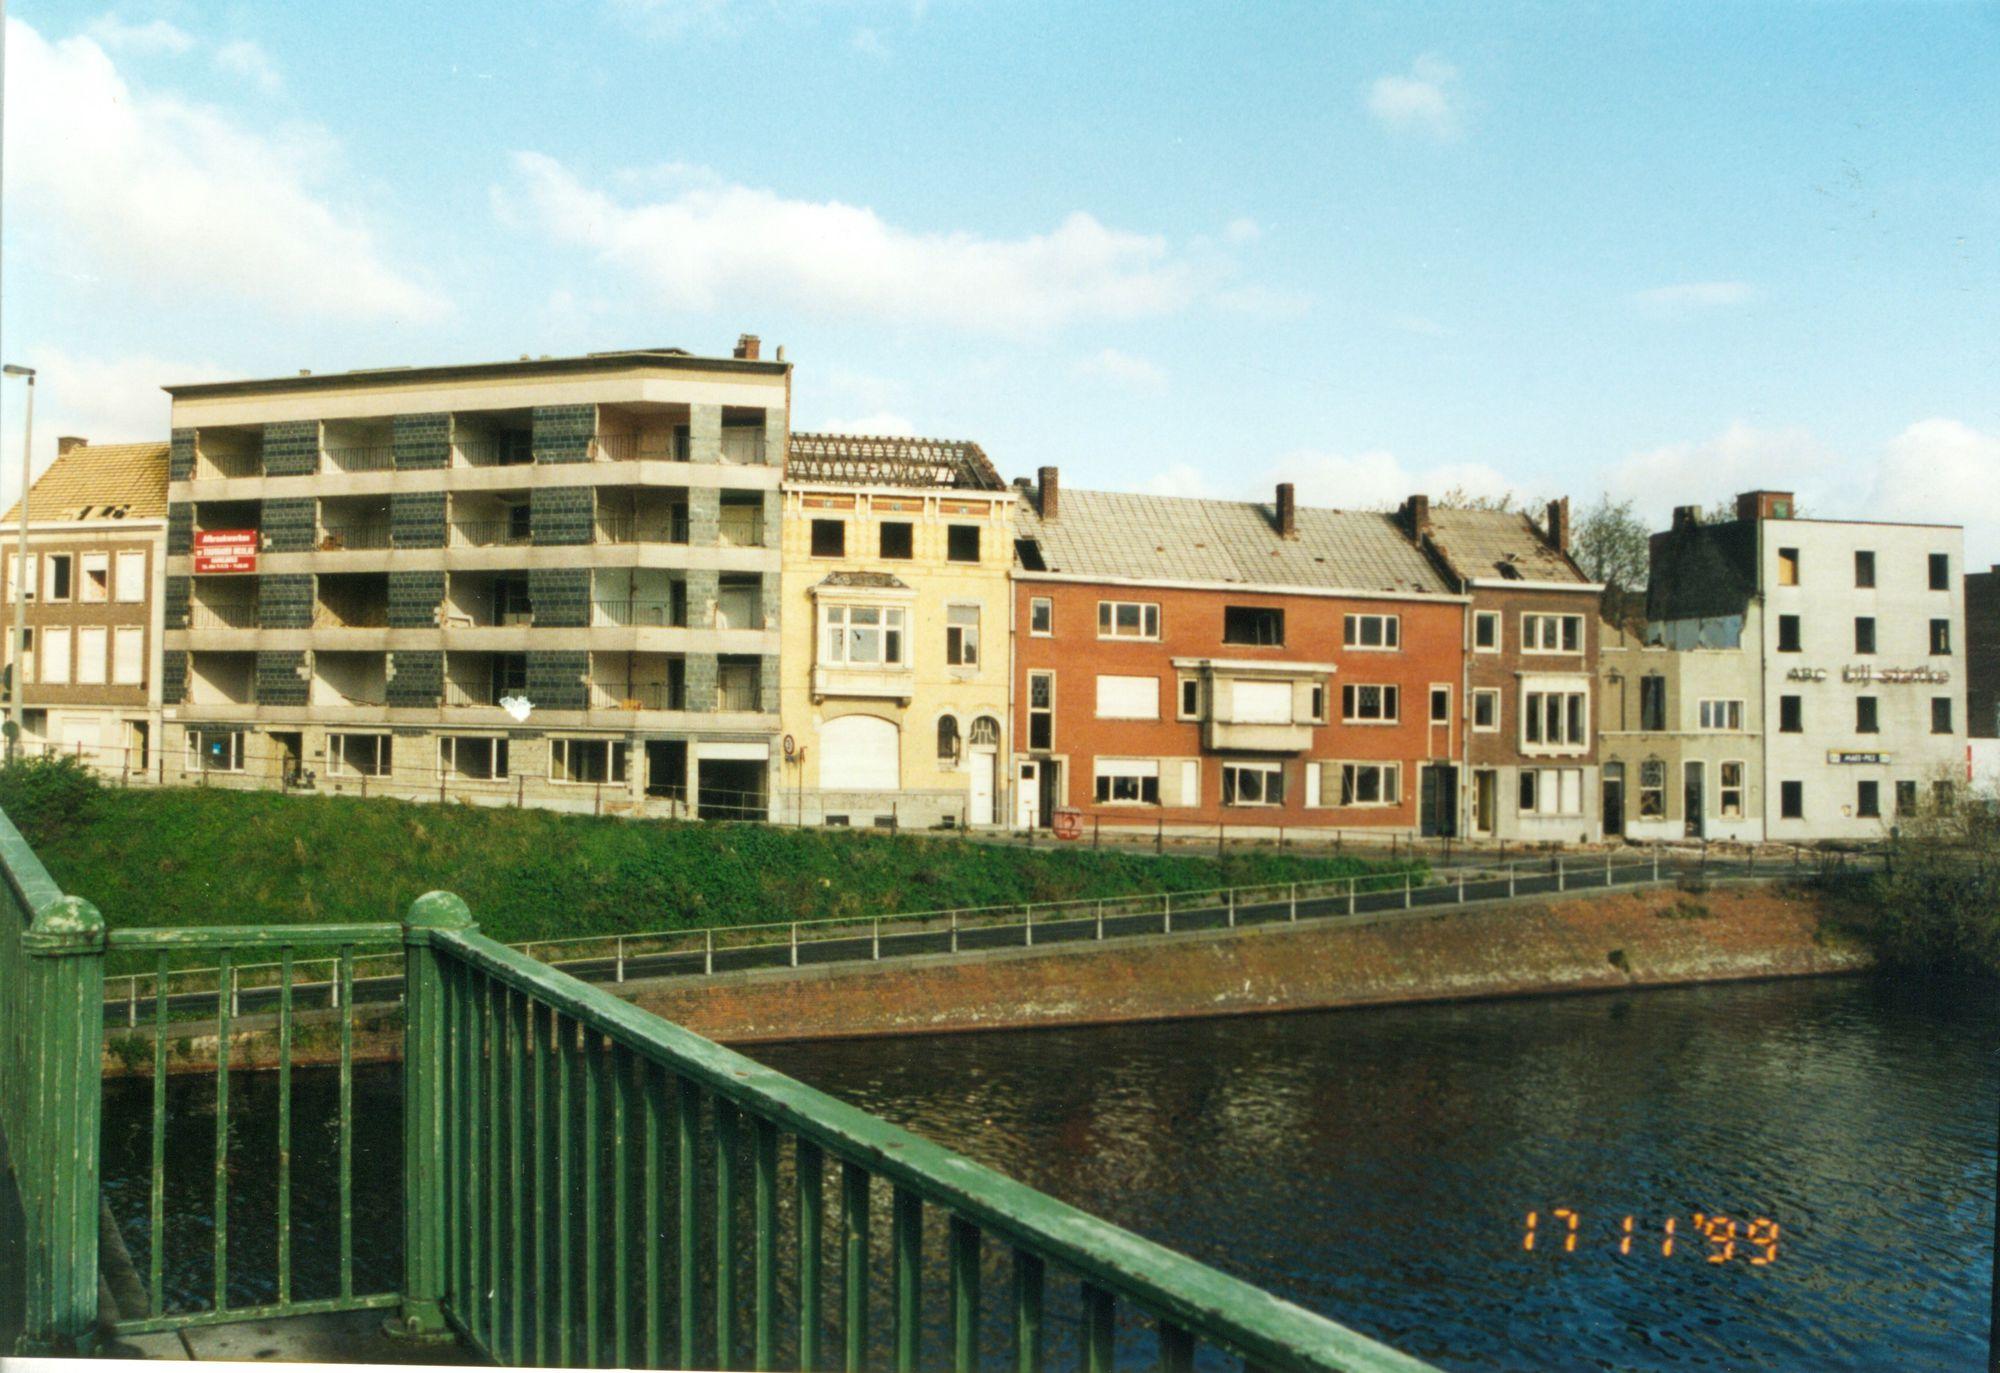 Nijverheidskaai 1999